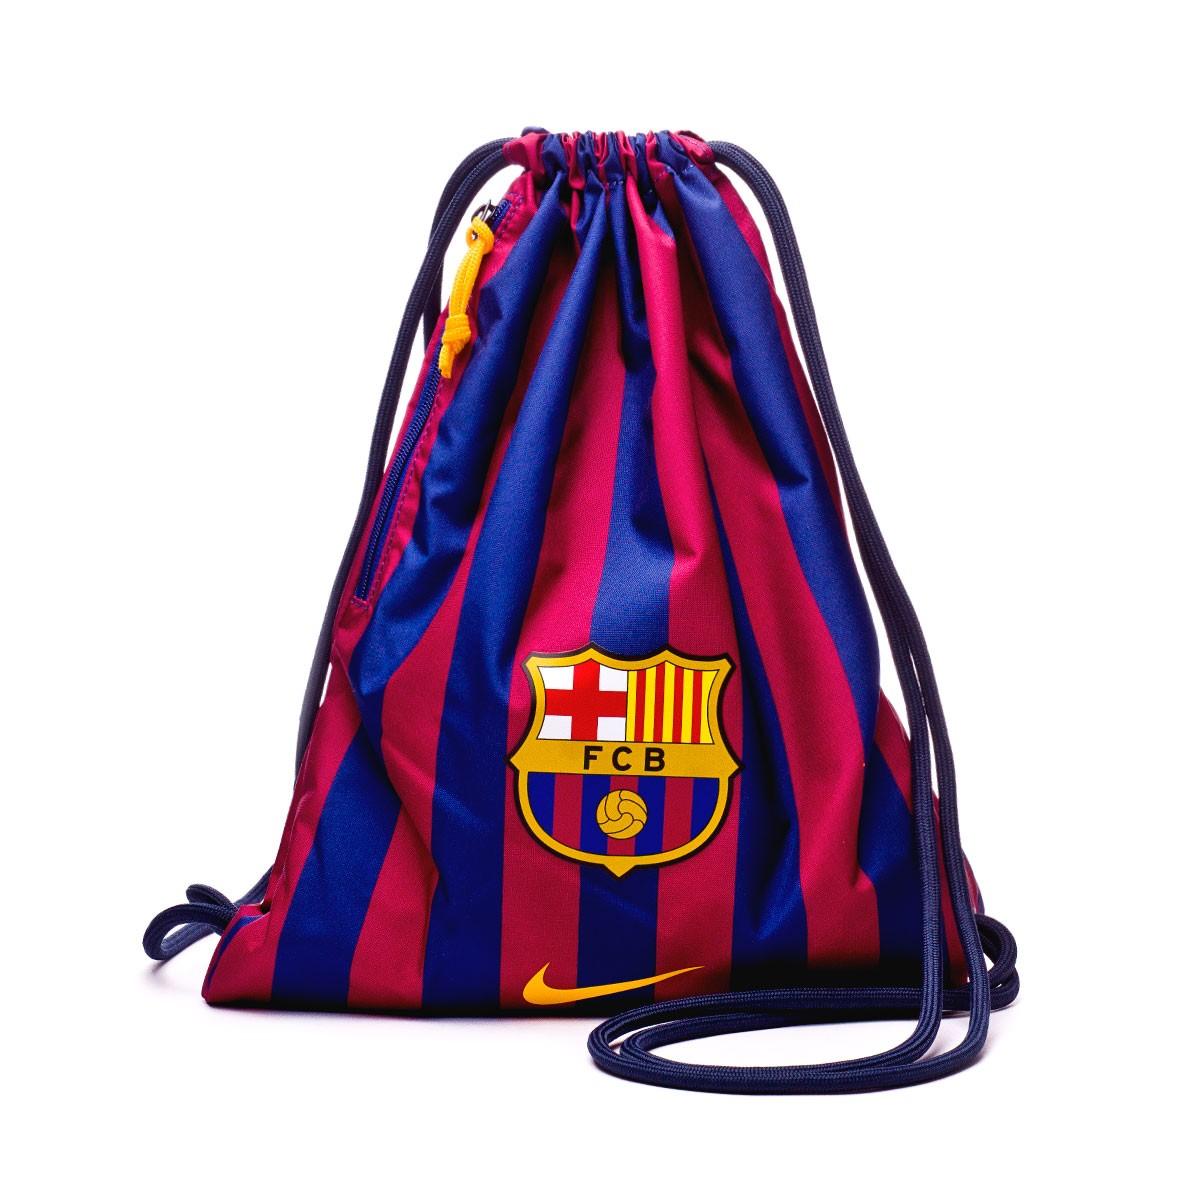 9f6023d46b8 Backpack Nike FC Barcelona Stadium Football GymSack Deep royal blue-Obsidian -University gold - Football store Fútbol Emotion